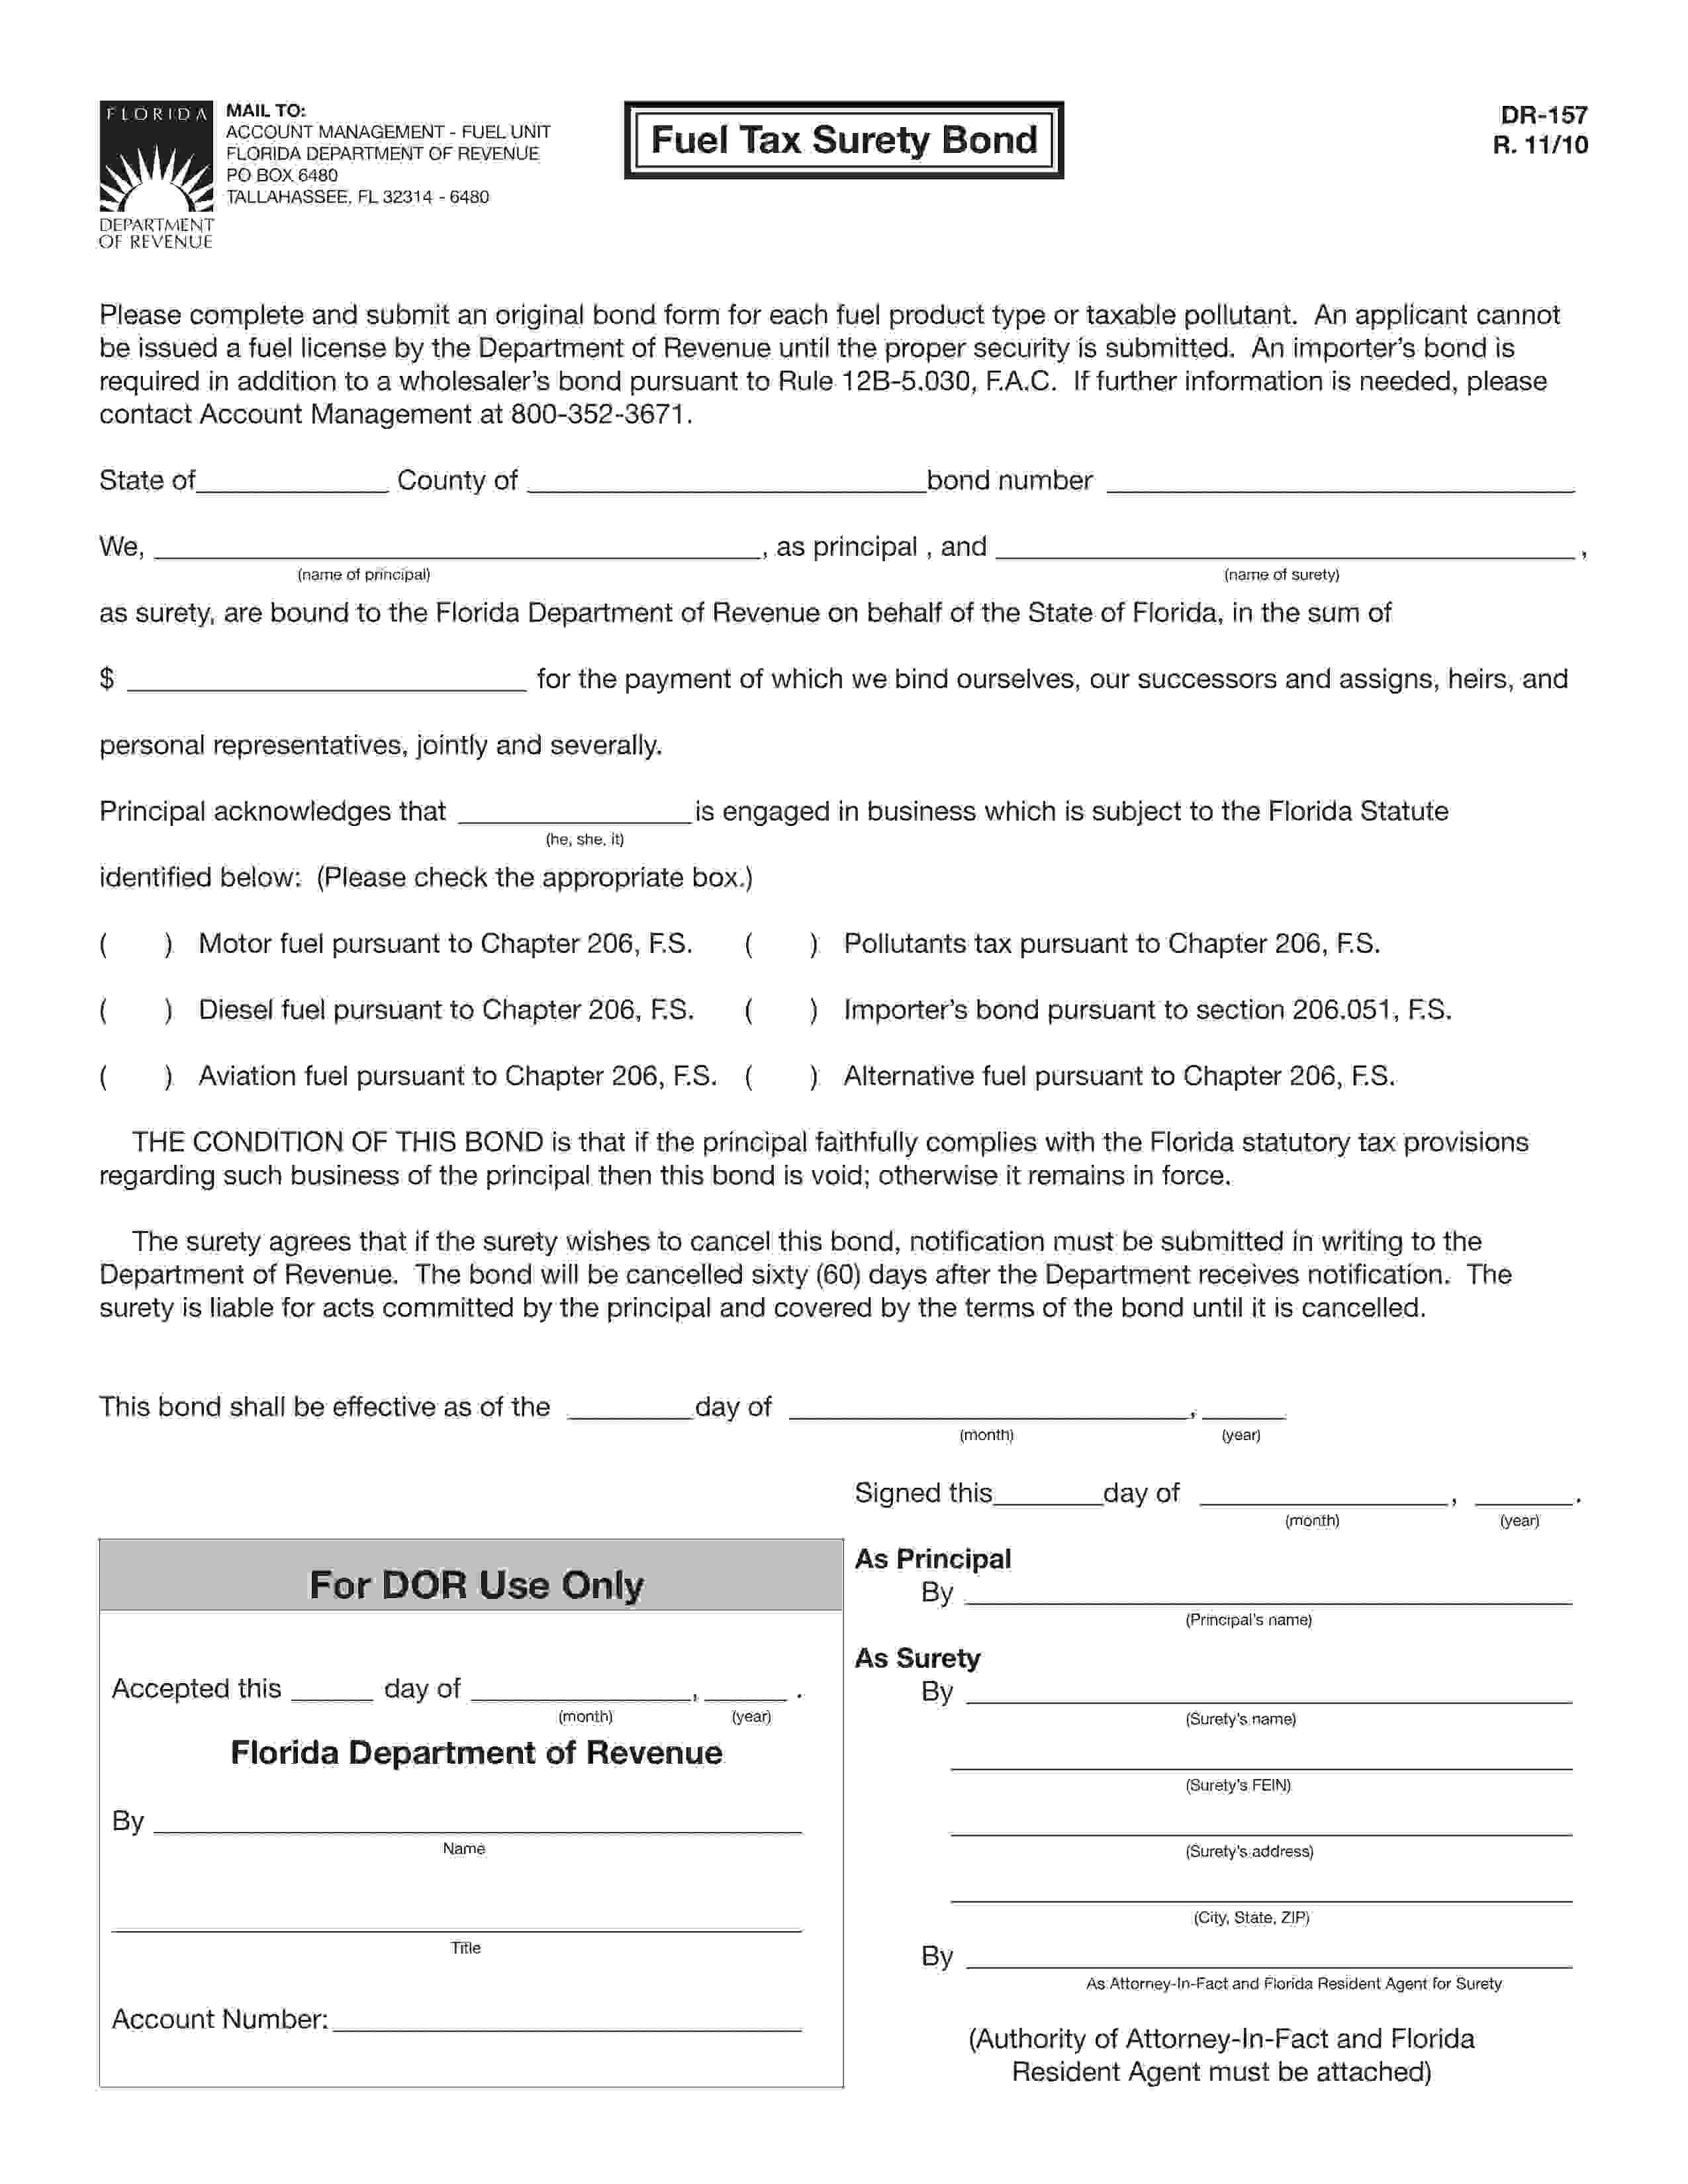 Florida Department Of Revenue, Fuel Unit Fuel Tax: Alternative Fuel Bond sample image